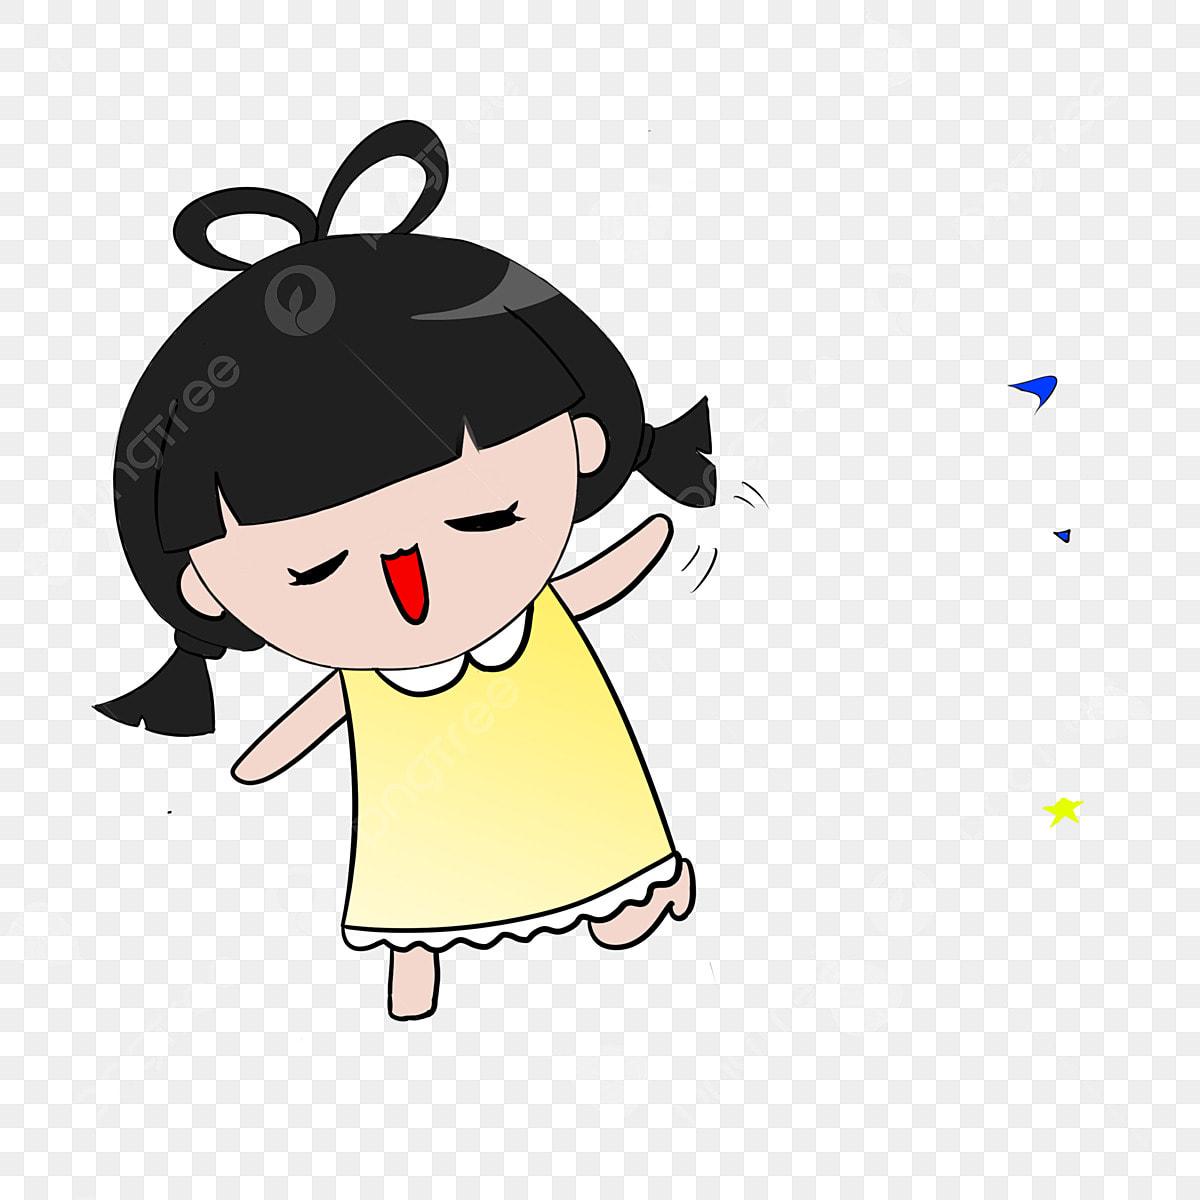 Gadis Kecil El Pakaian Kuning El Sedikit Gadis Kartun